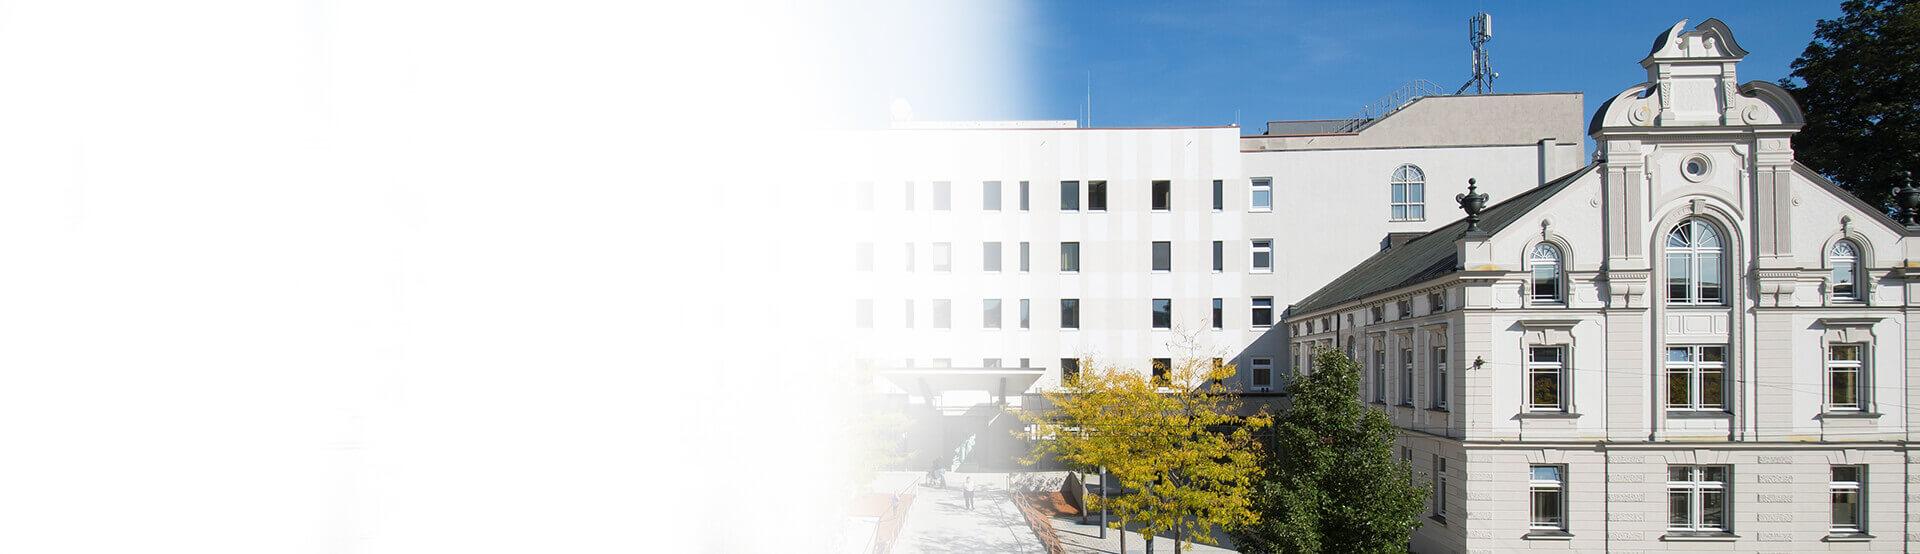 Hessing Stiftung Hessing Unternehmensgruppe